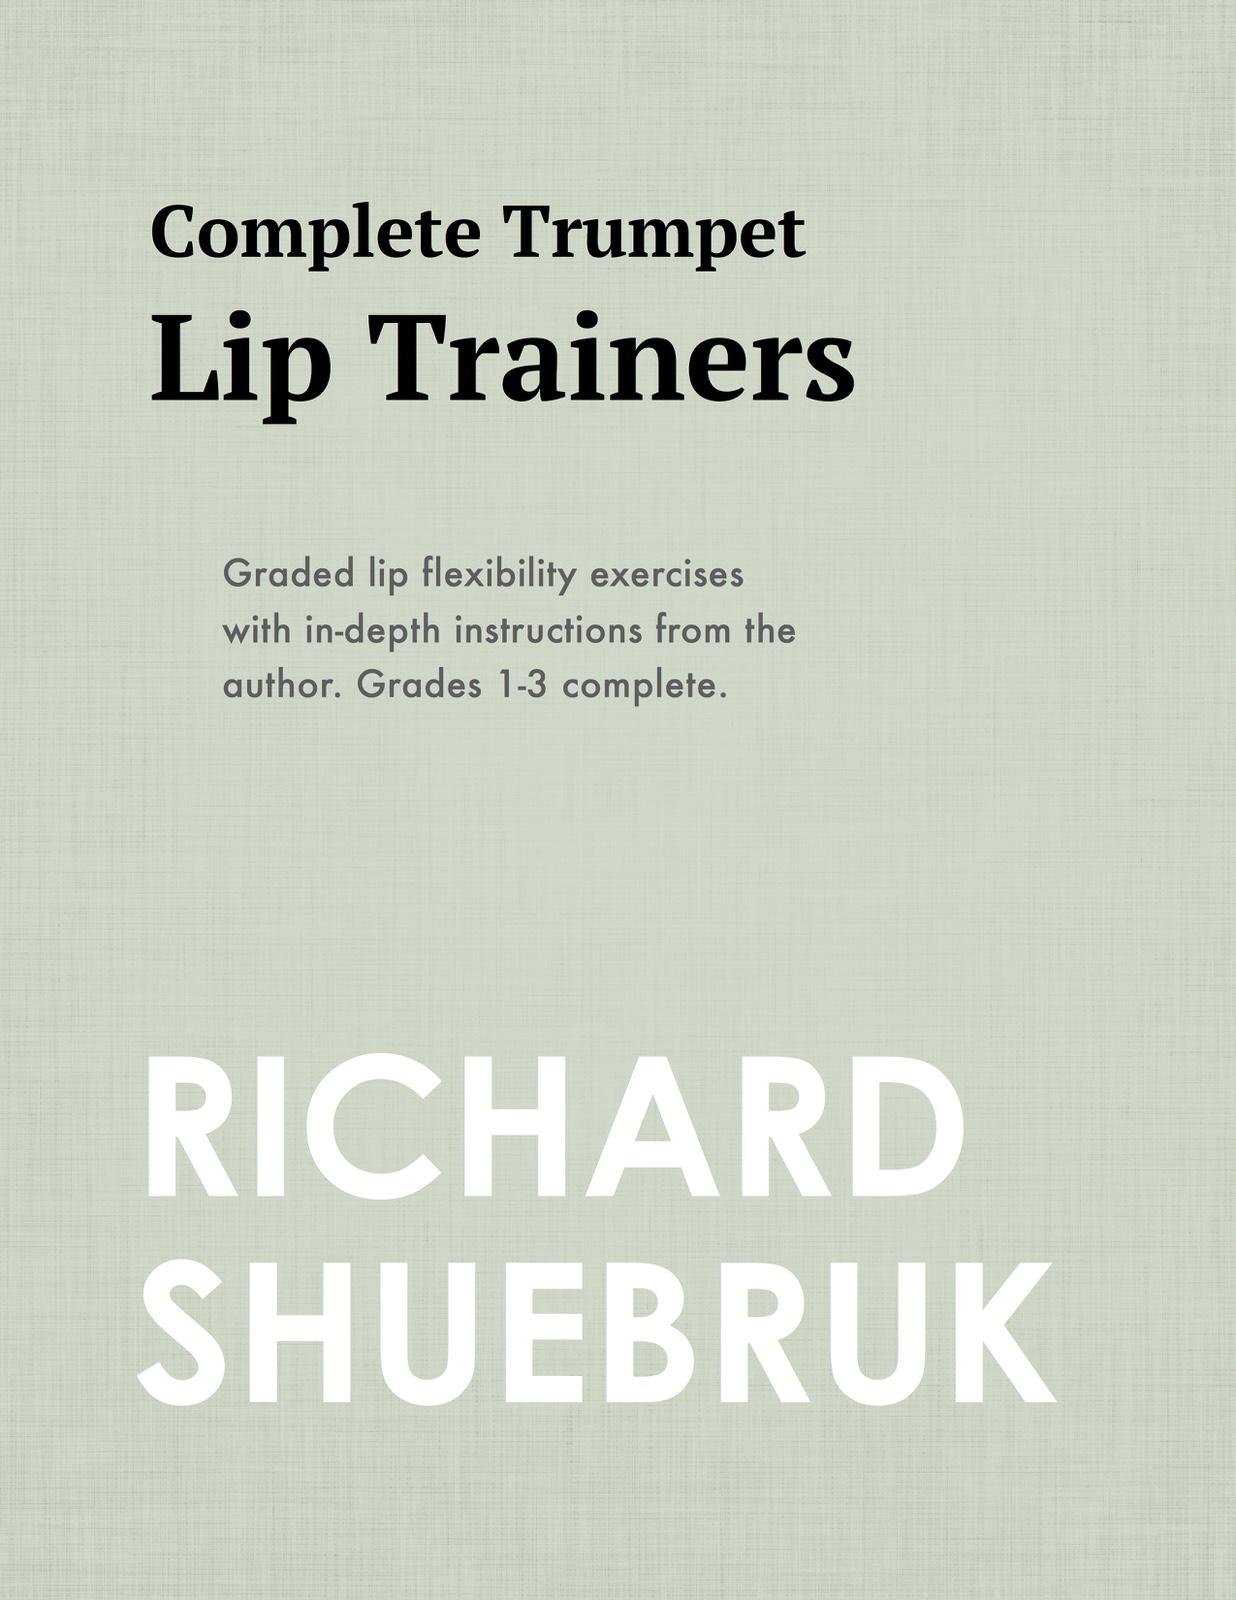 Shuebruk, Lip Trainers for Trumpet-p01